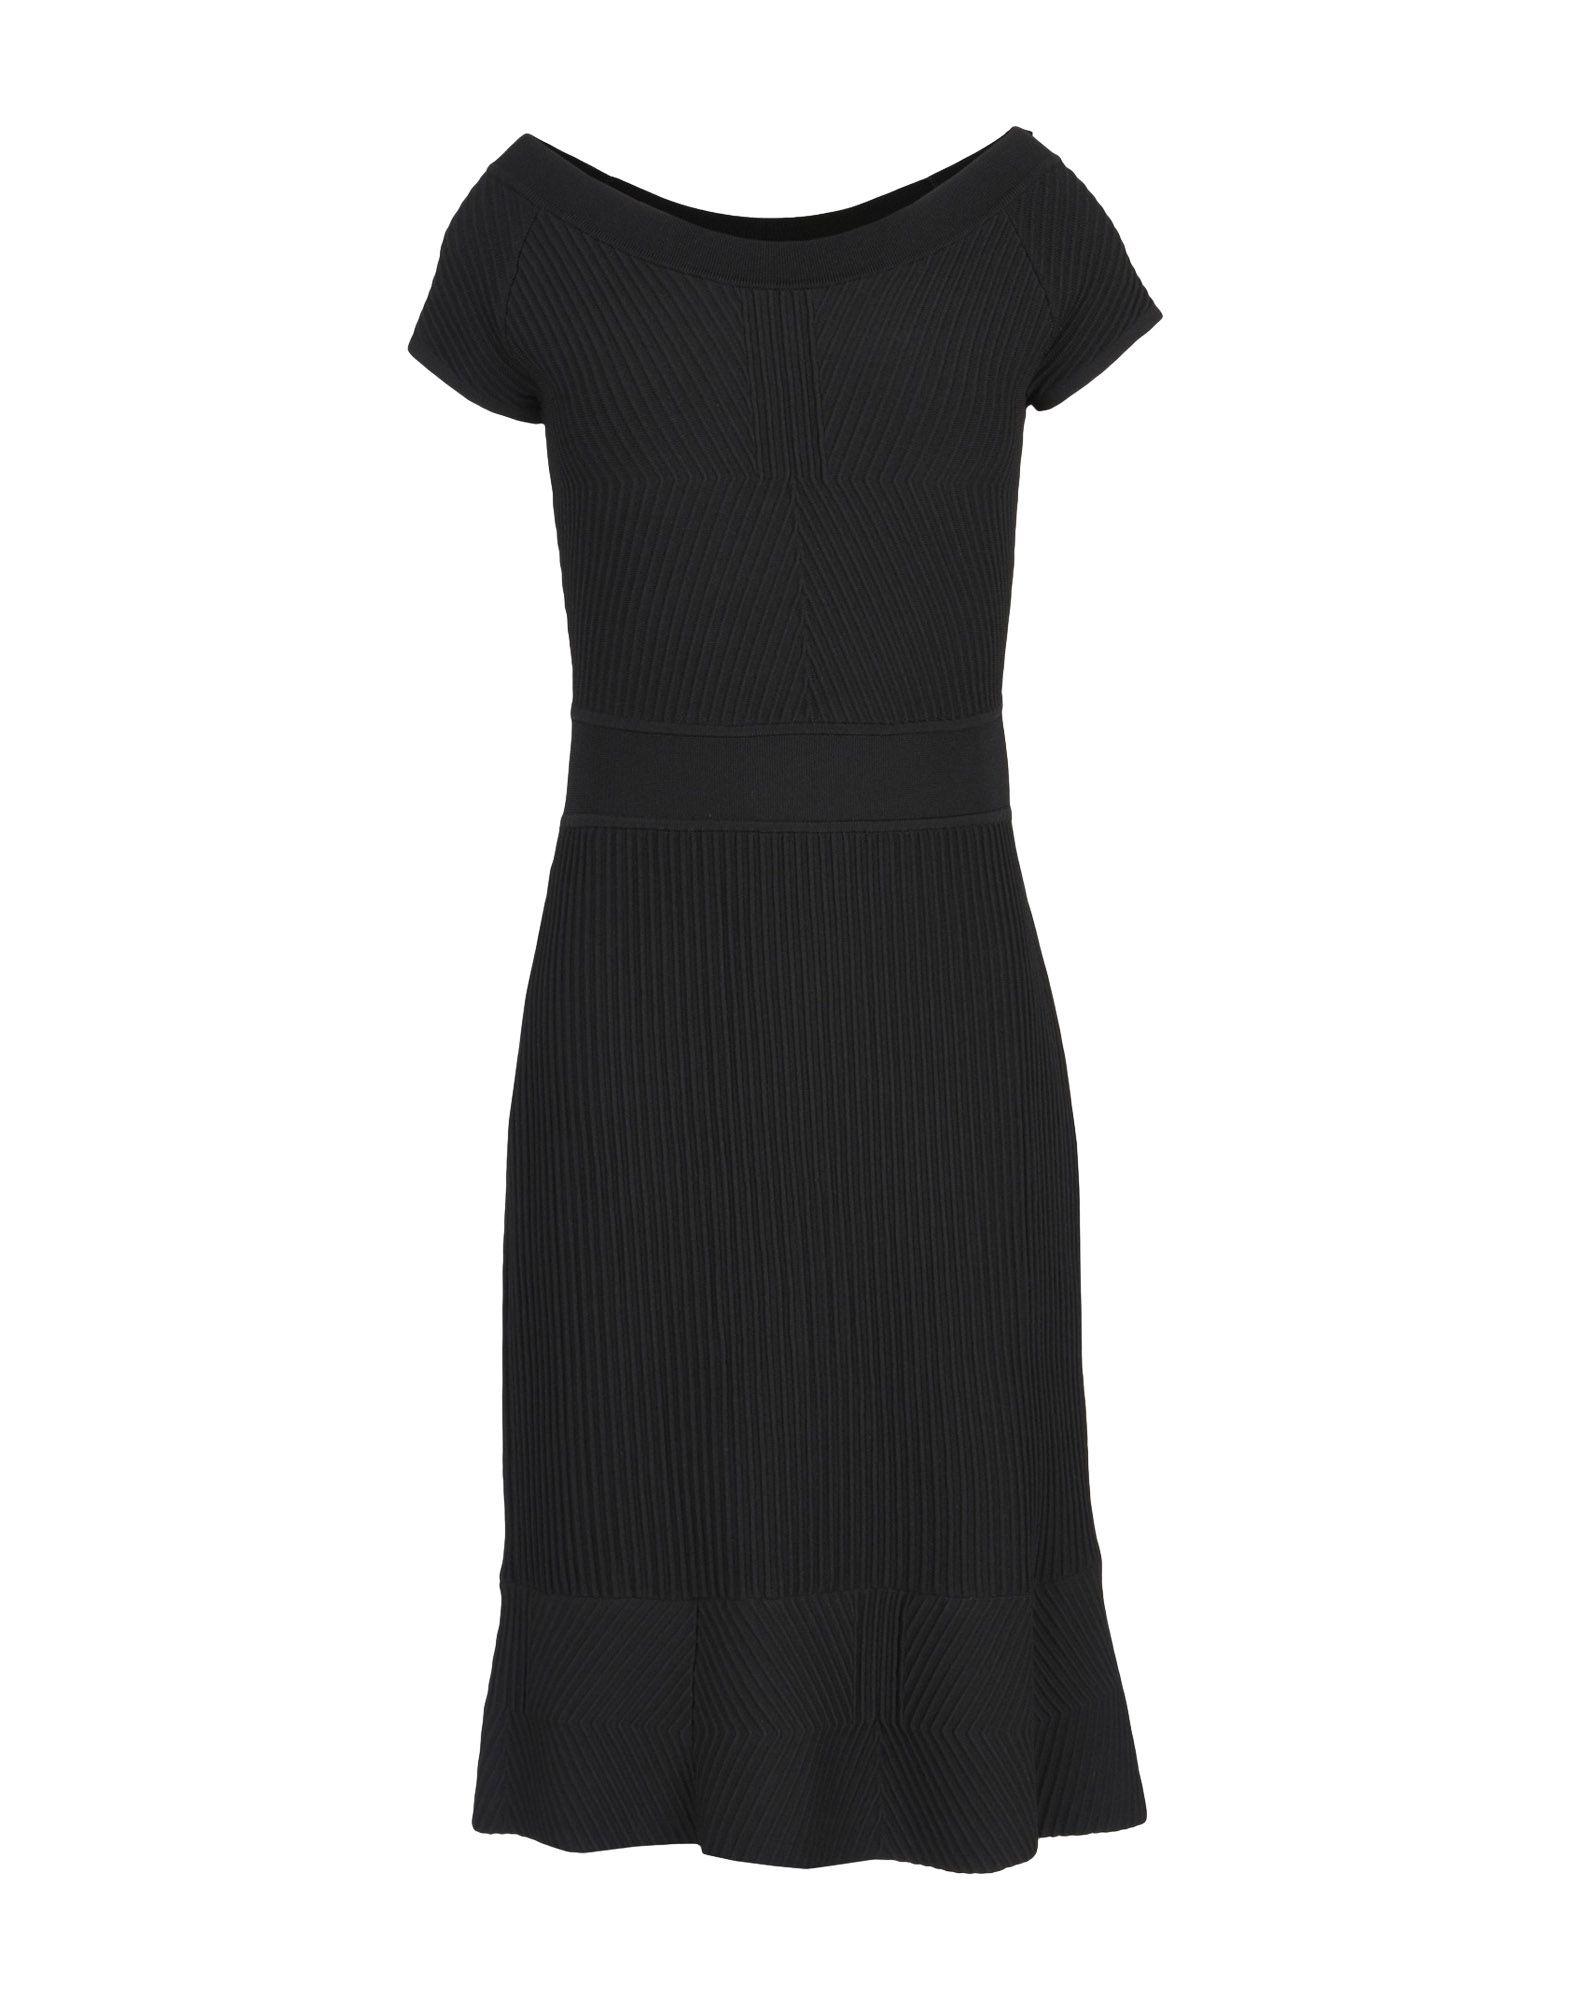 ARMANI COLLEZIONI Damen Kurzes Kleid Farbe Schwarz Größe 4